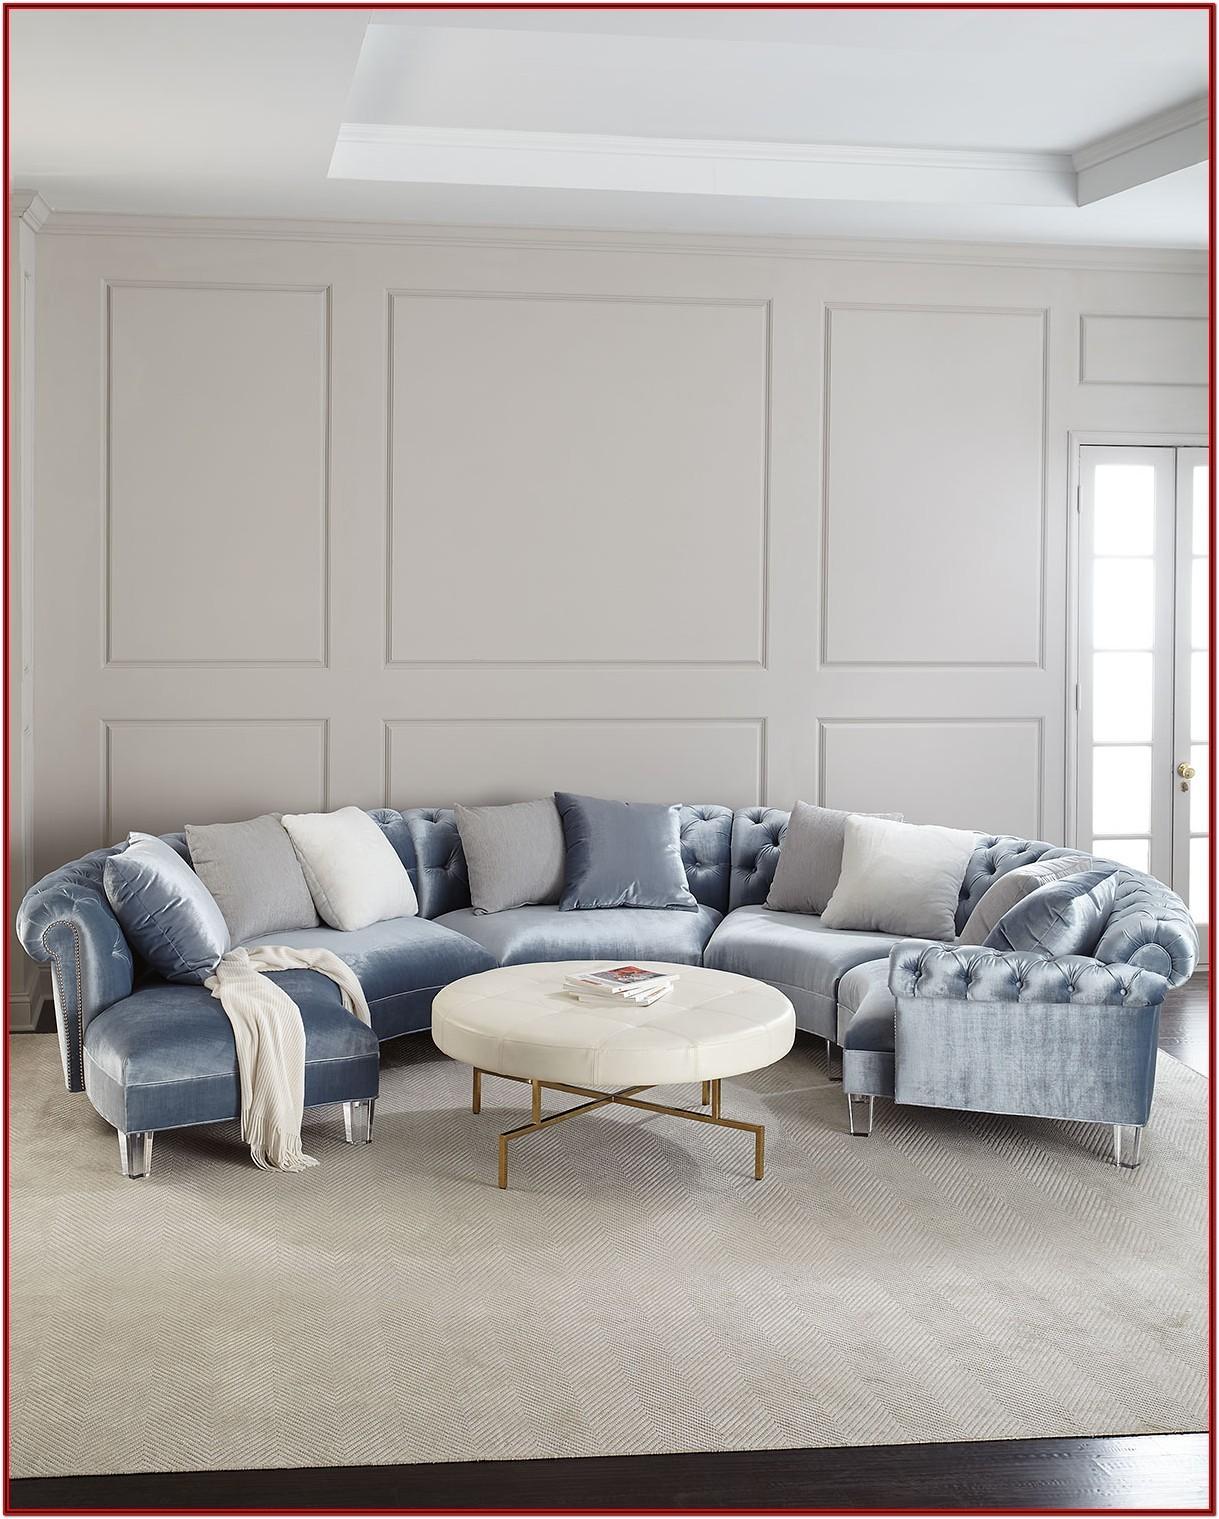 Curved Living Room Furniture